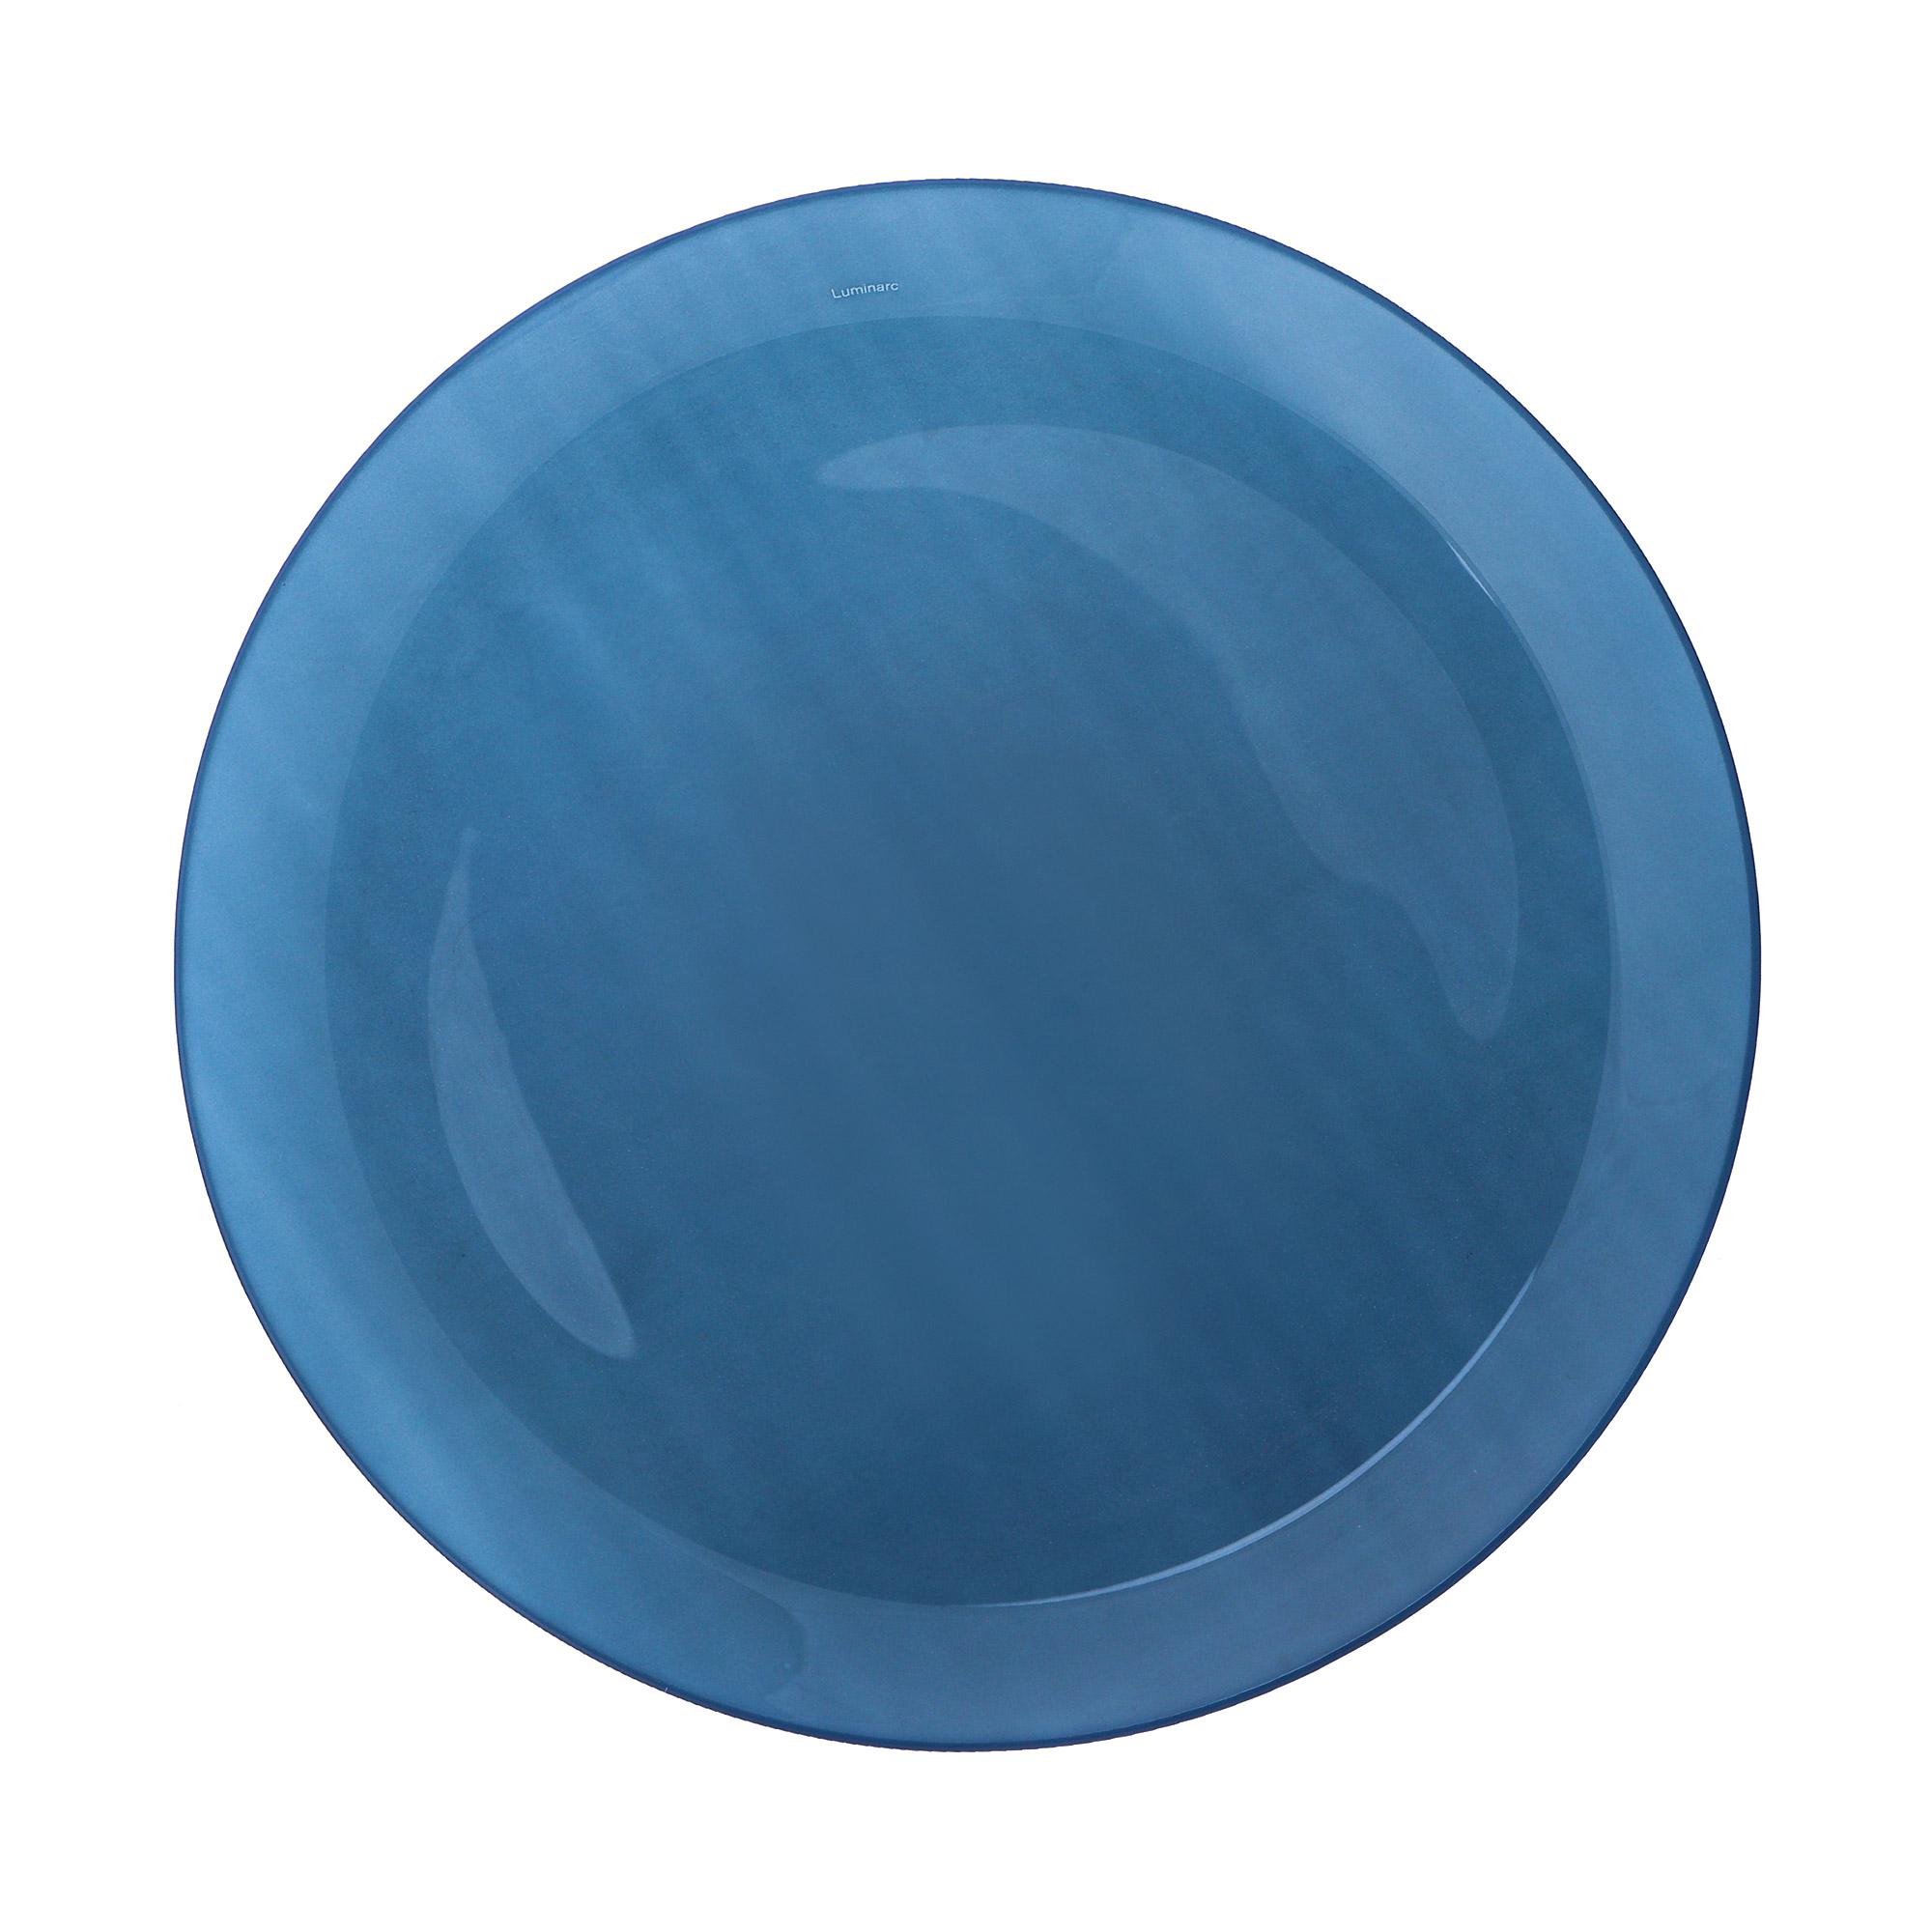 Фото - Тарелка обеденная 26 см Luminarc arty marine тарелка обеденная 26 см luminarc arty marine